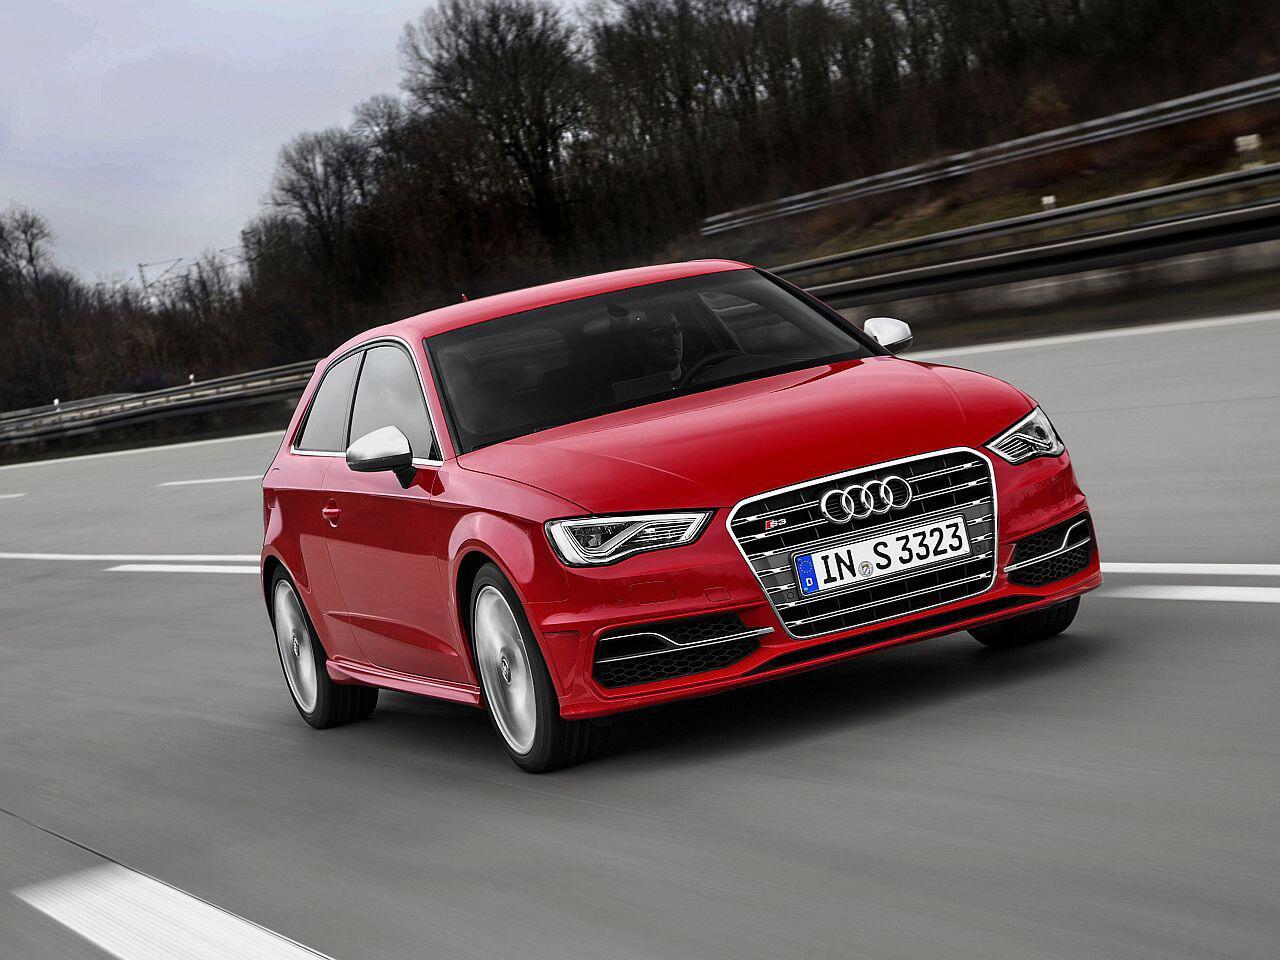 Bild zu 6. Platz: Audi S3